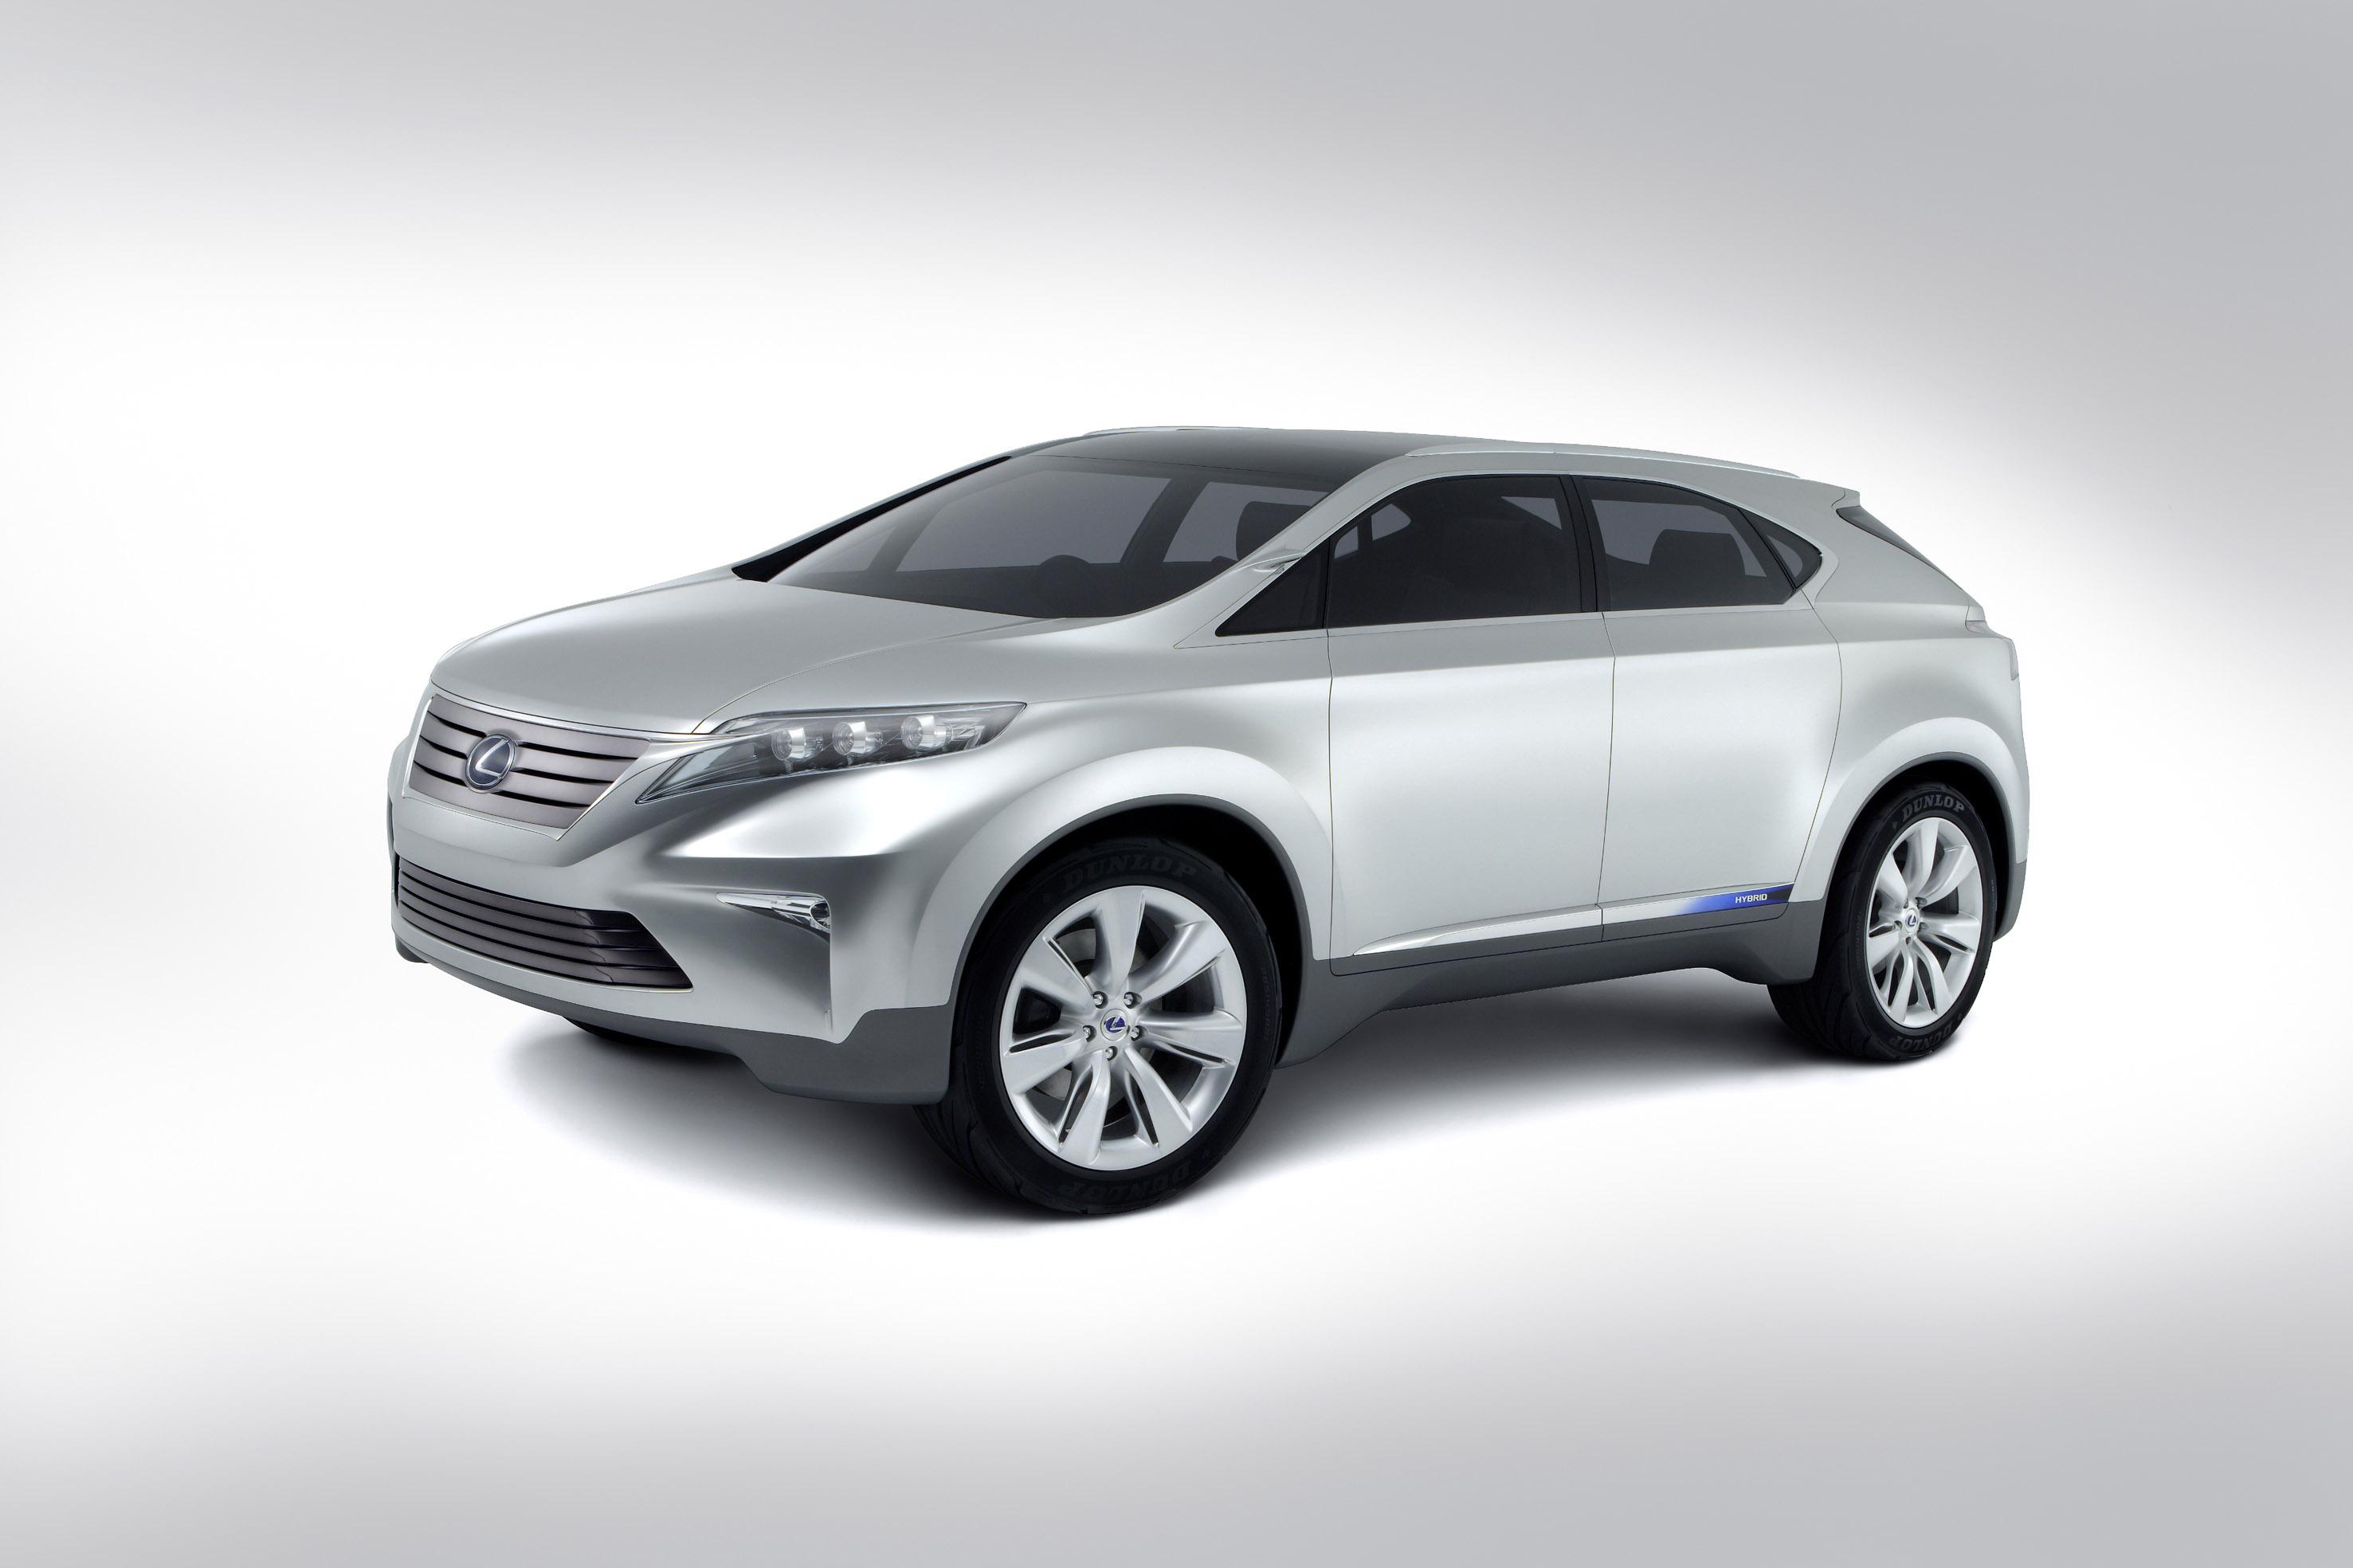 lexus to show hybrid concept at australian international motor show. Black Bedroom Furniture Sets. Home Design Ideas